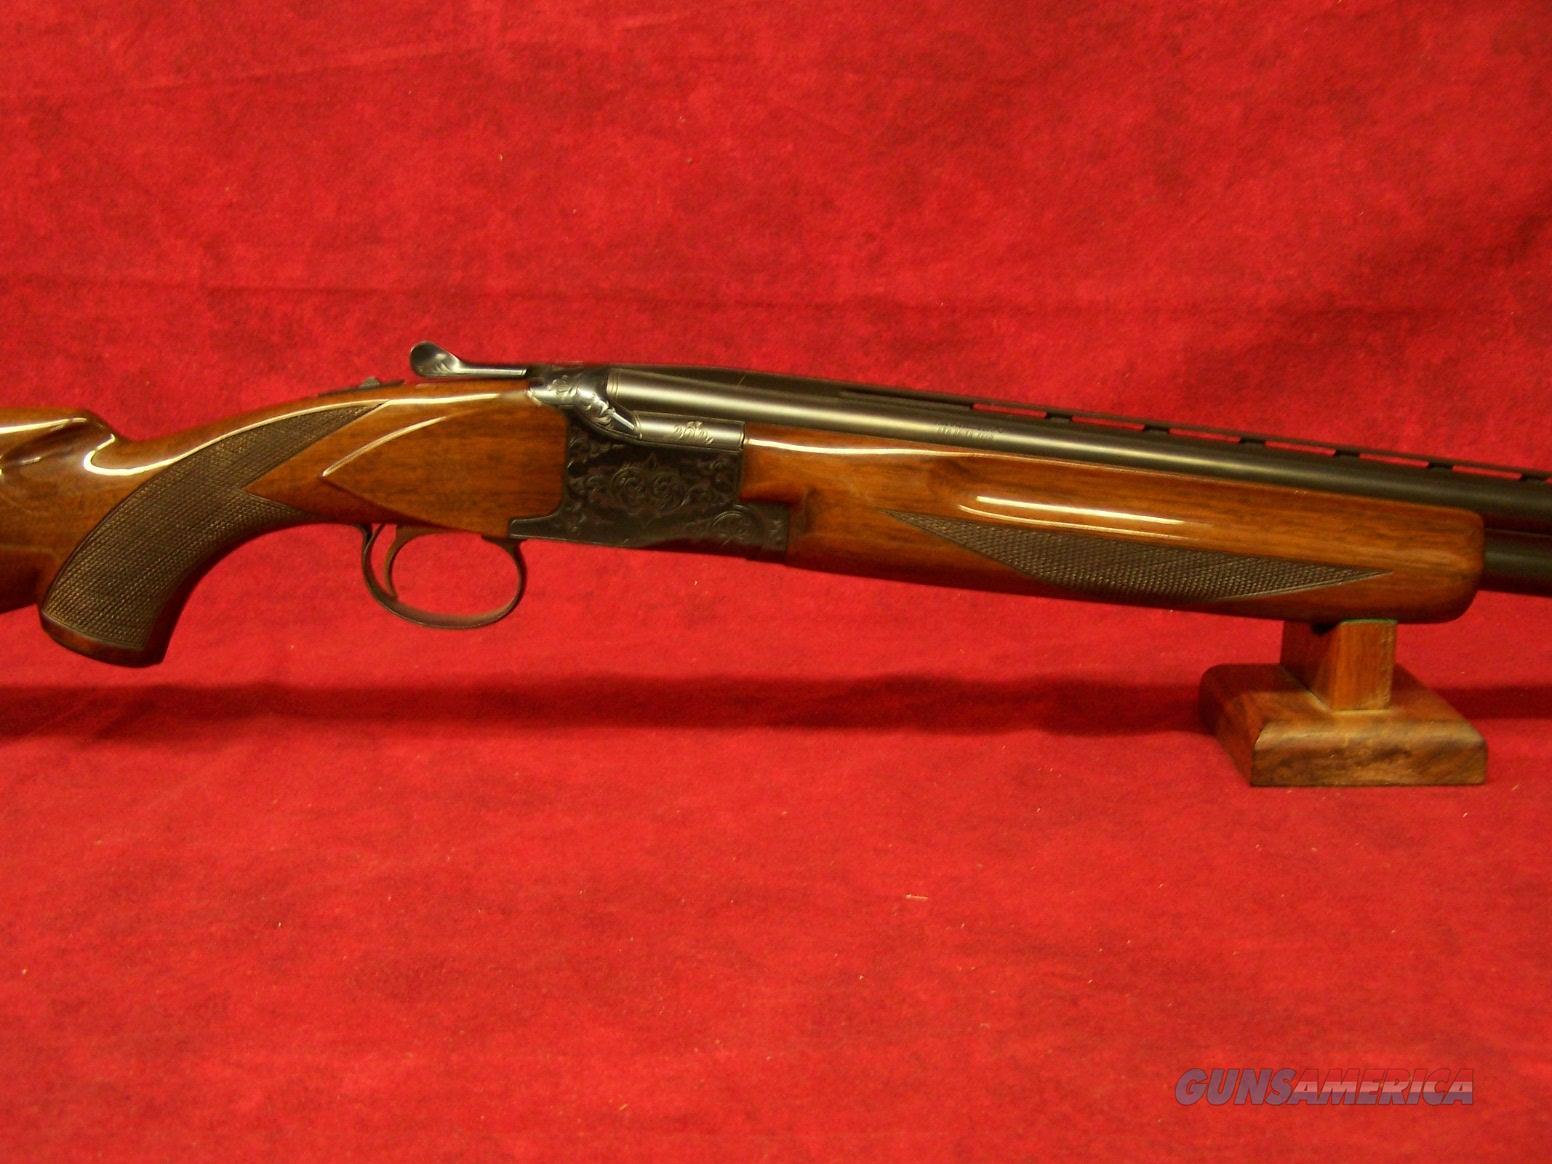 "Winchester 101 20ga 28"" F & Mod 3""  Guns > Shotguns > Winchester Shotguns - Modern > O/U > Hunting"